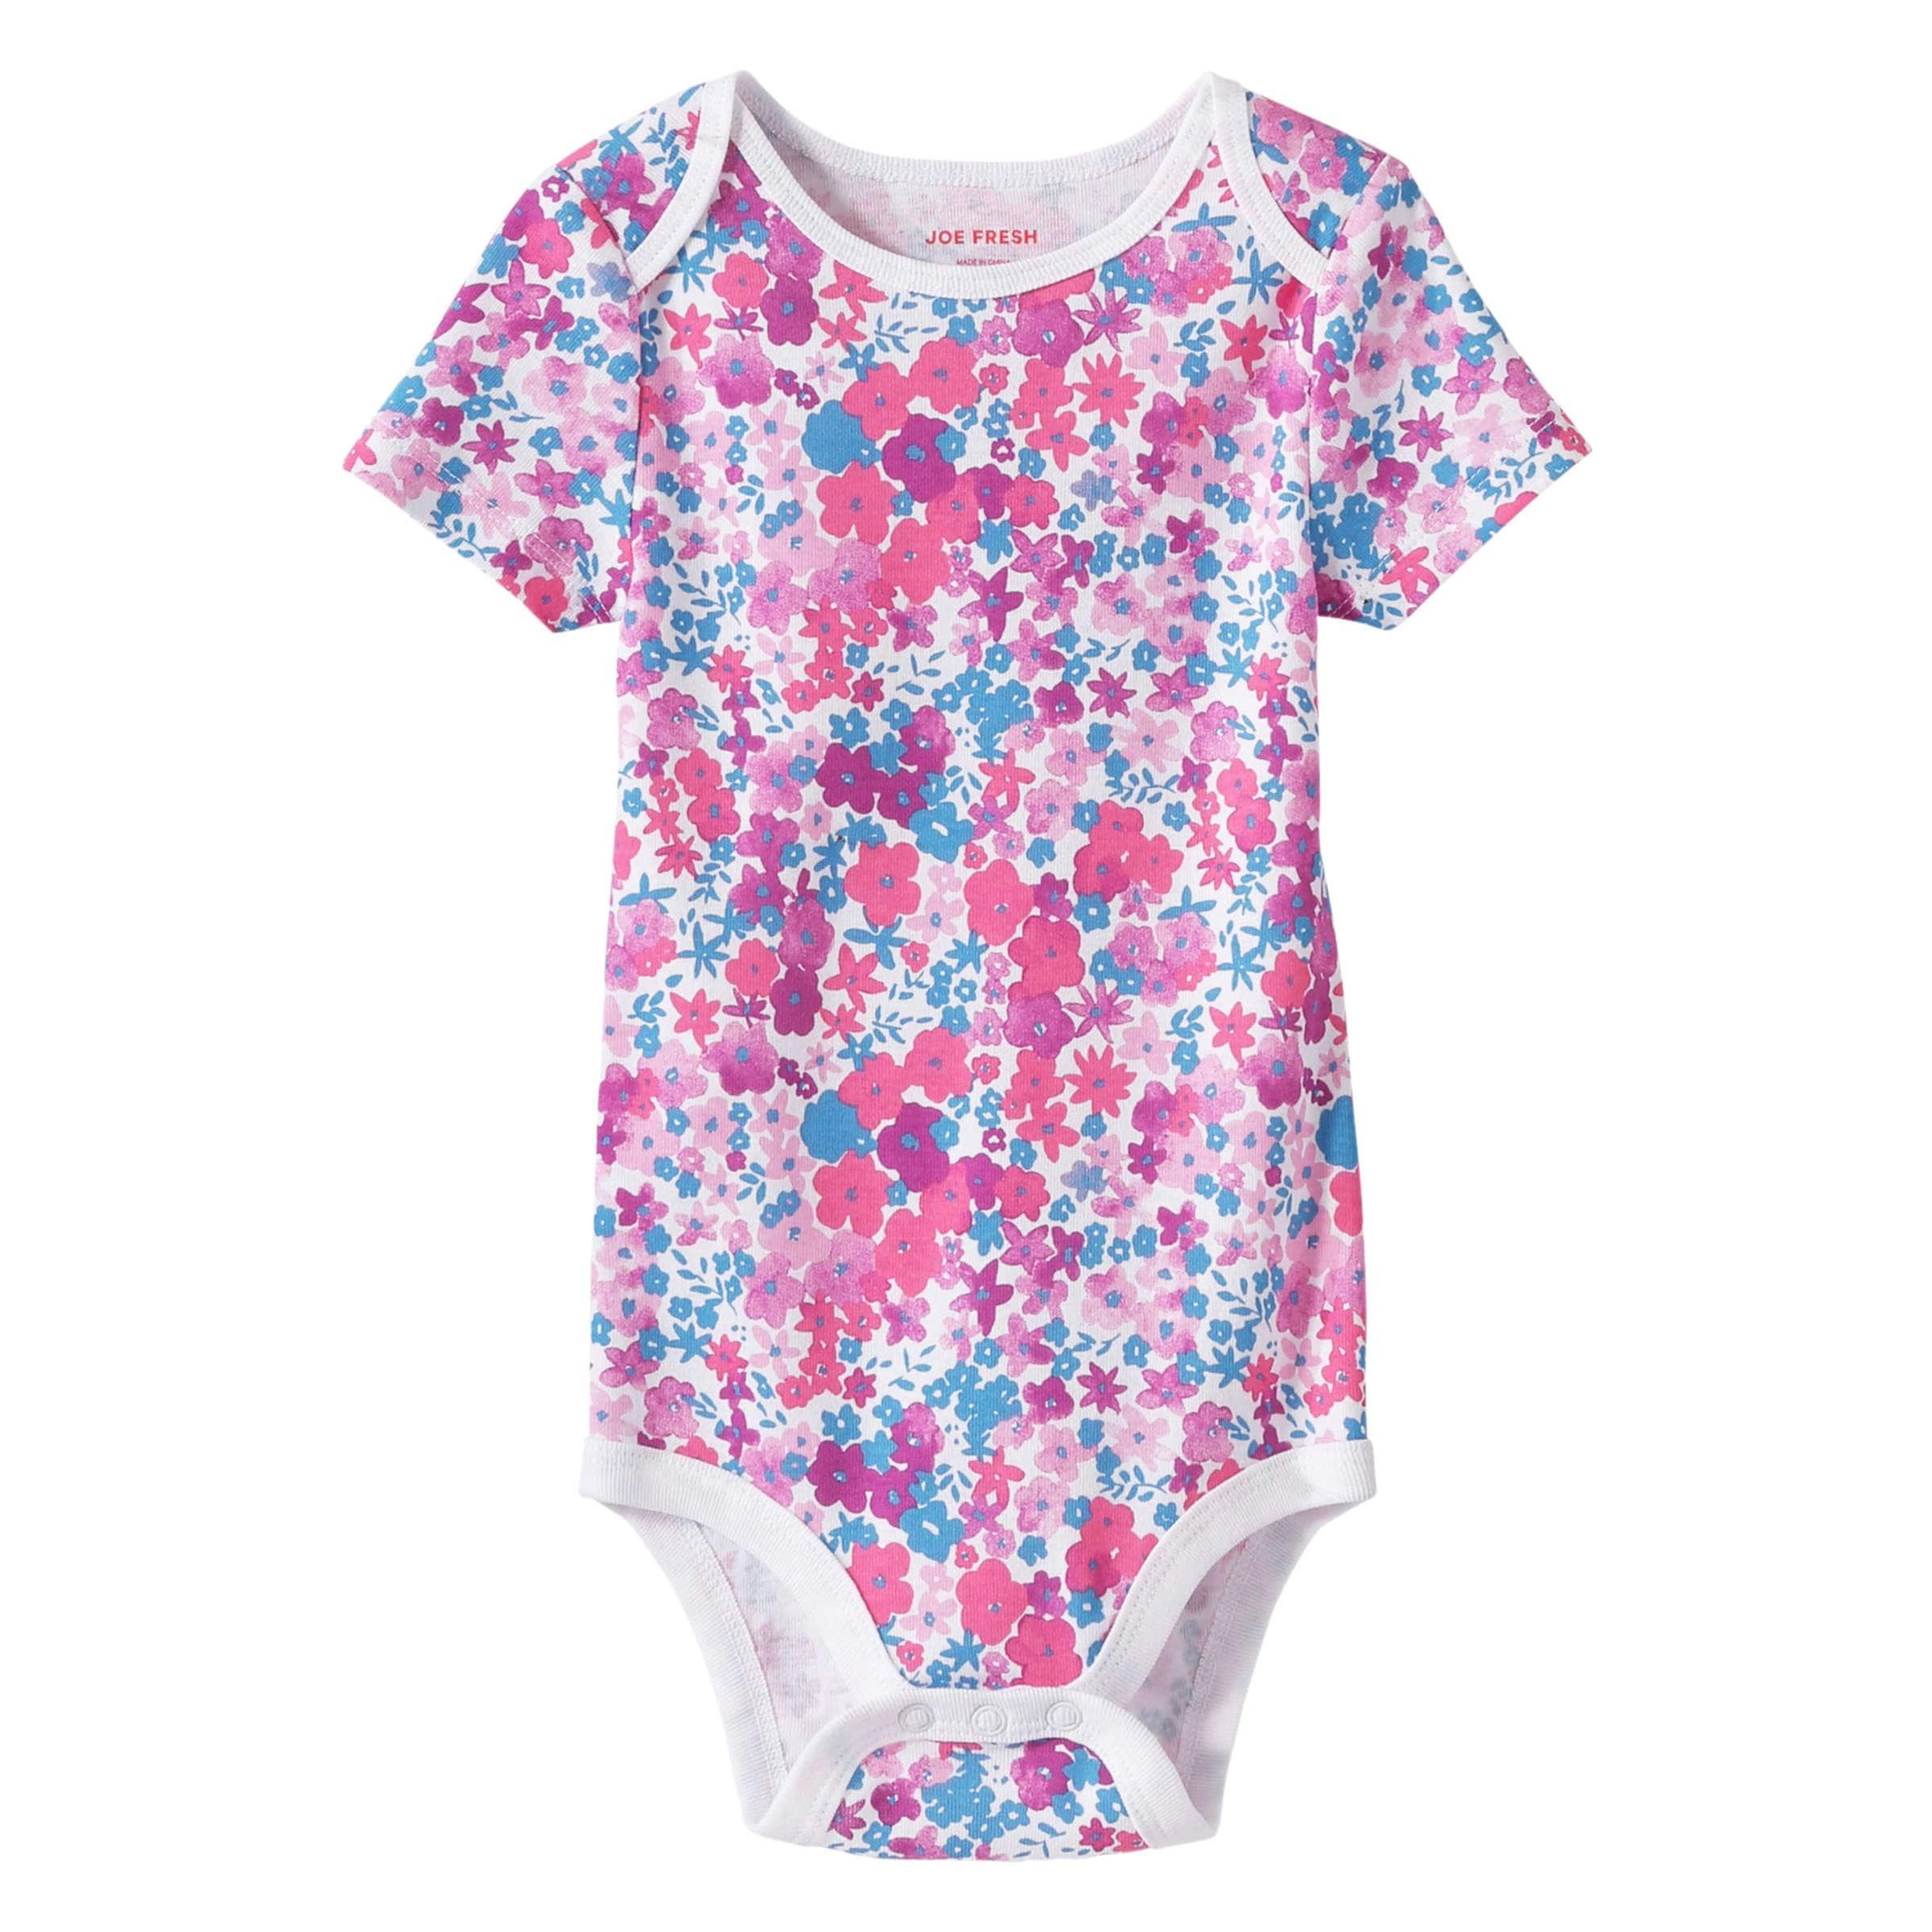 1224149095 Baby Girls' Essential Print Bodysuit in Pink from Joe Fresh